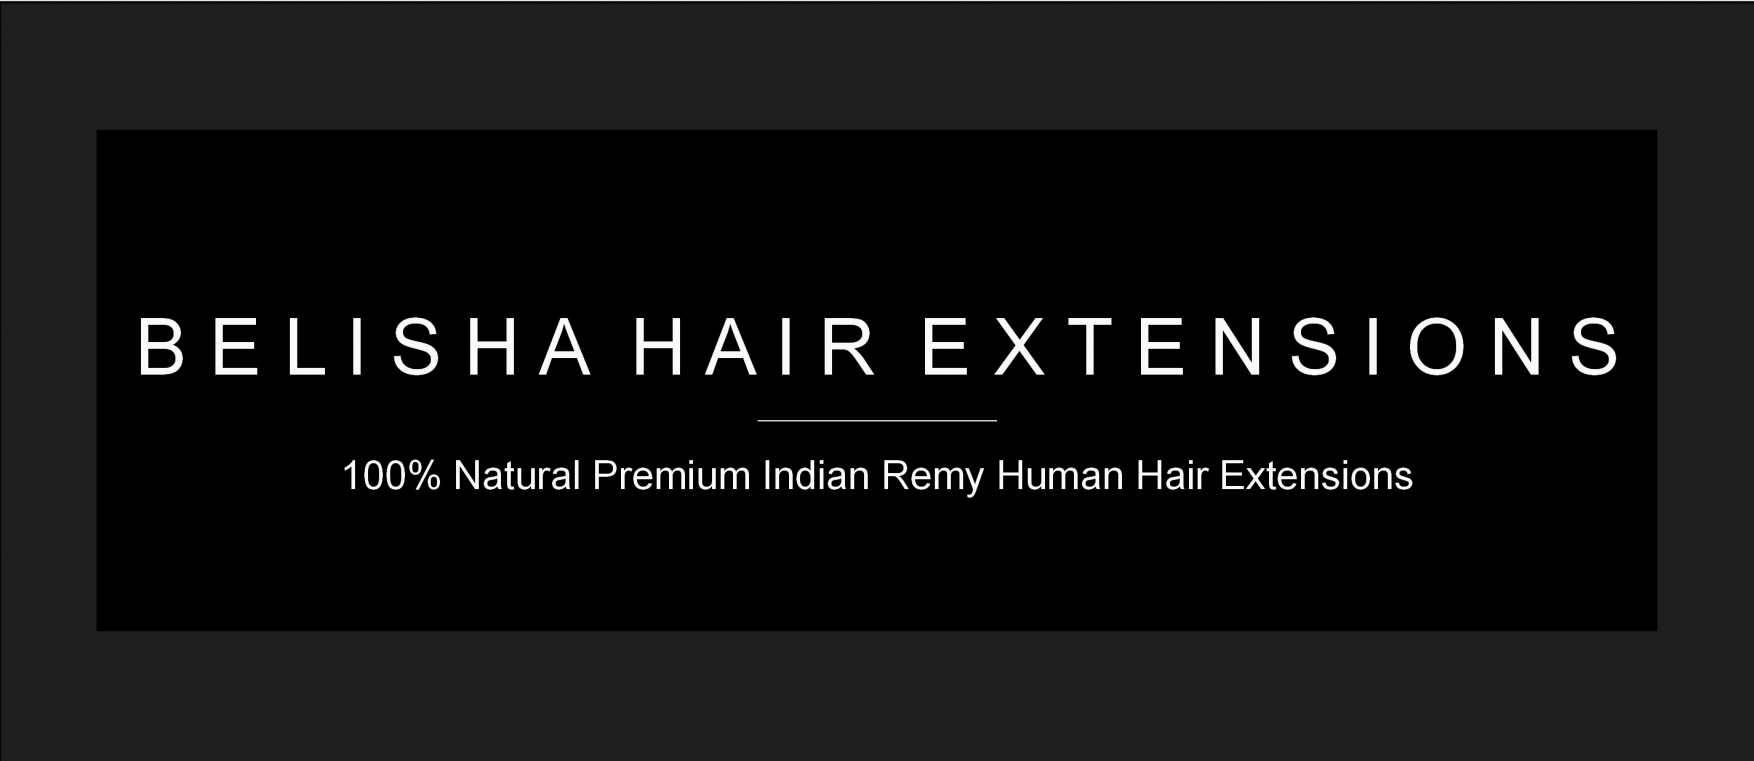 BeliSha Hair Extensions Logo